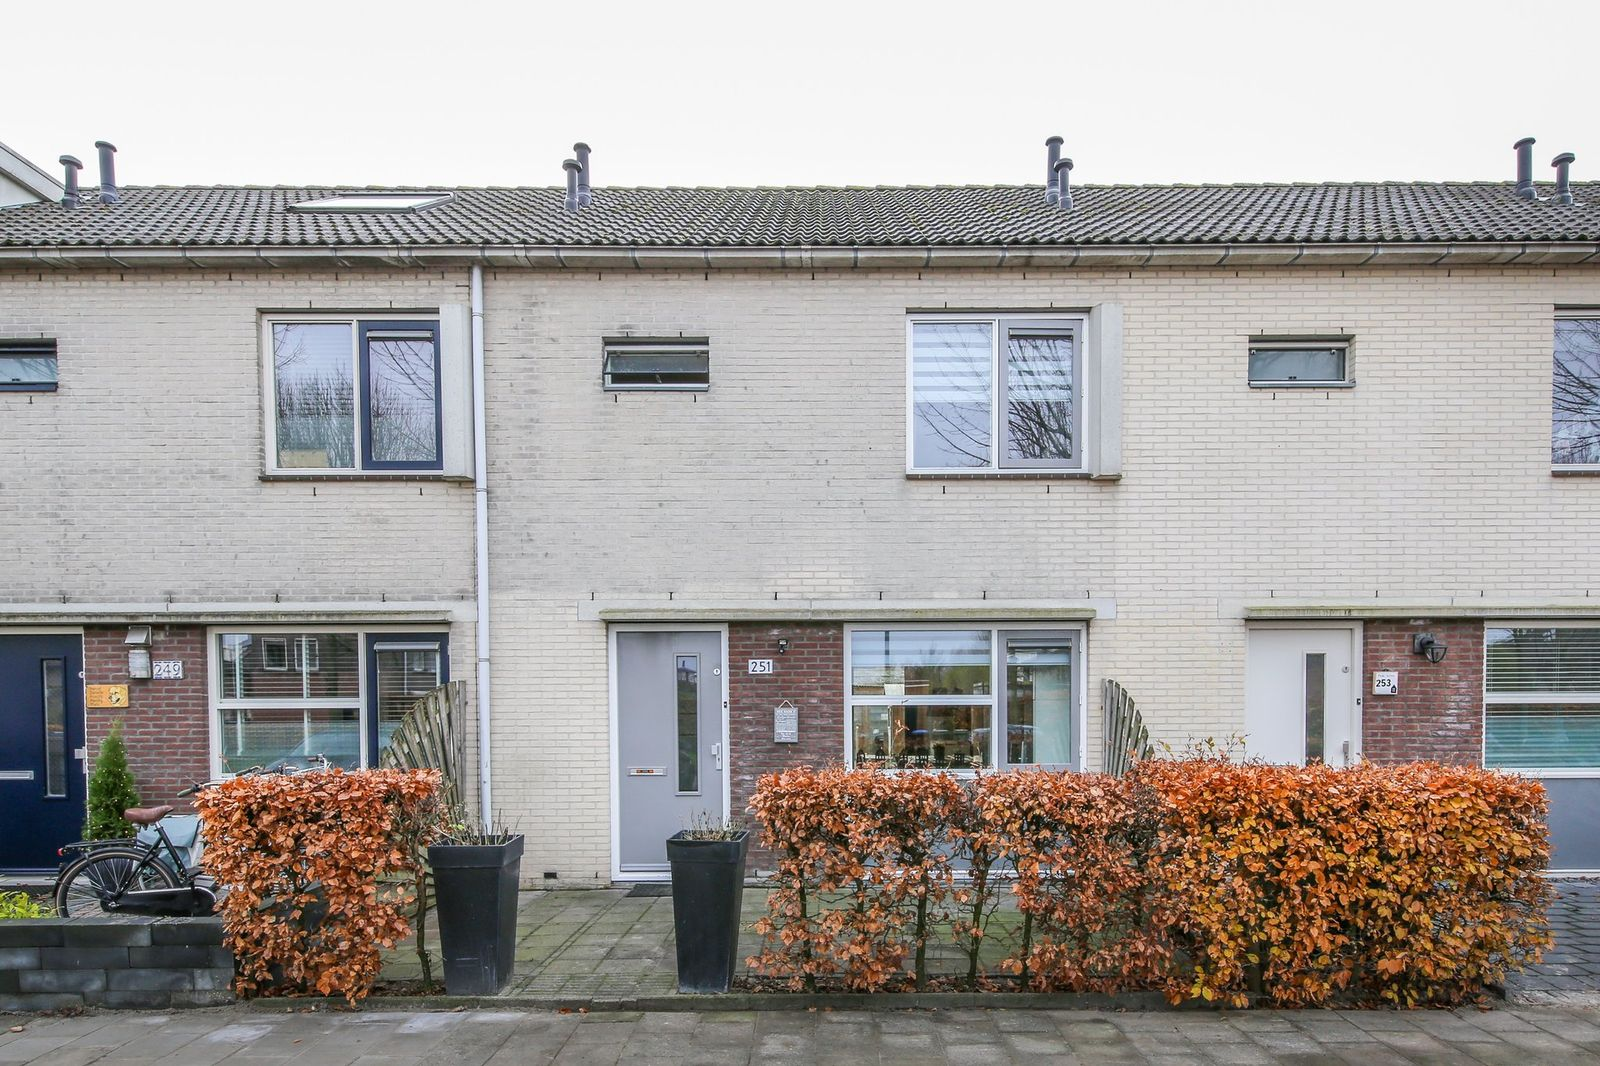 Rijnland 251, Lelystad